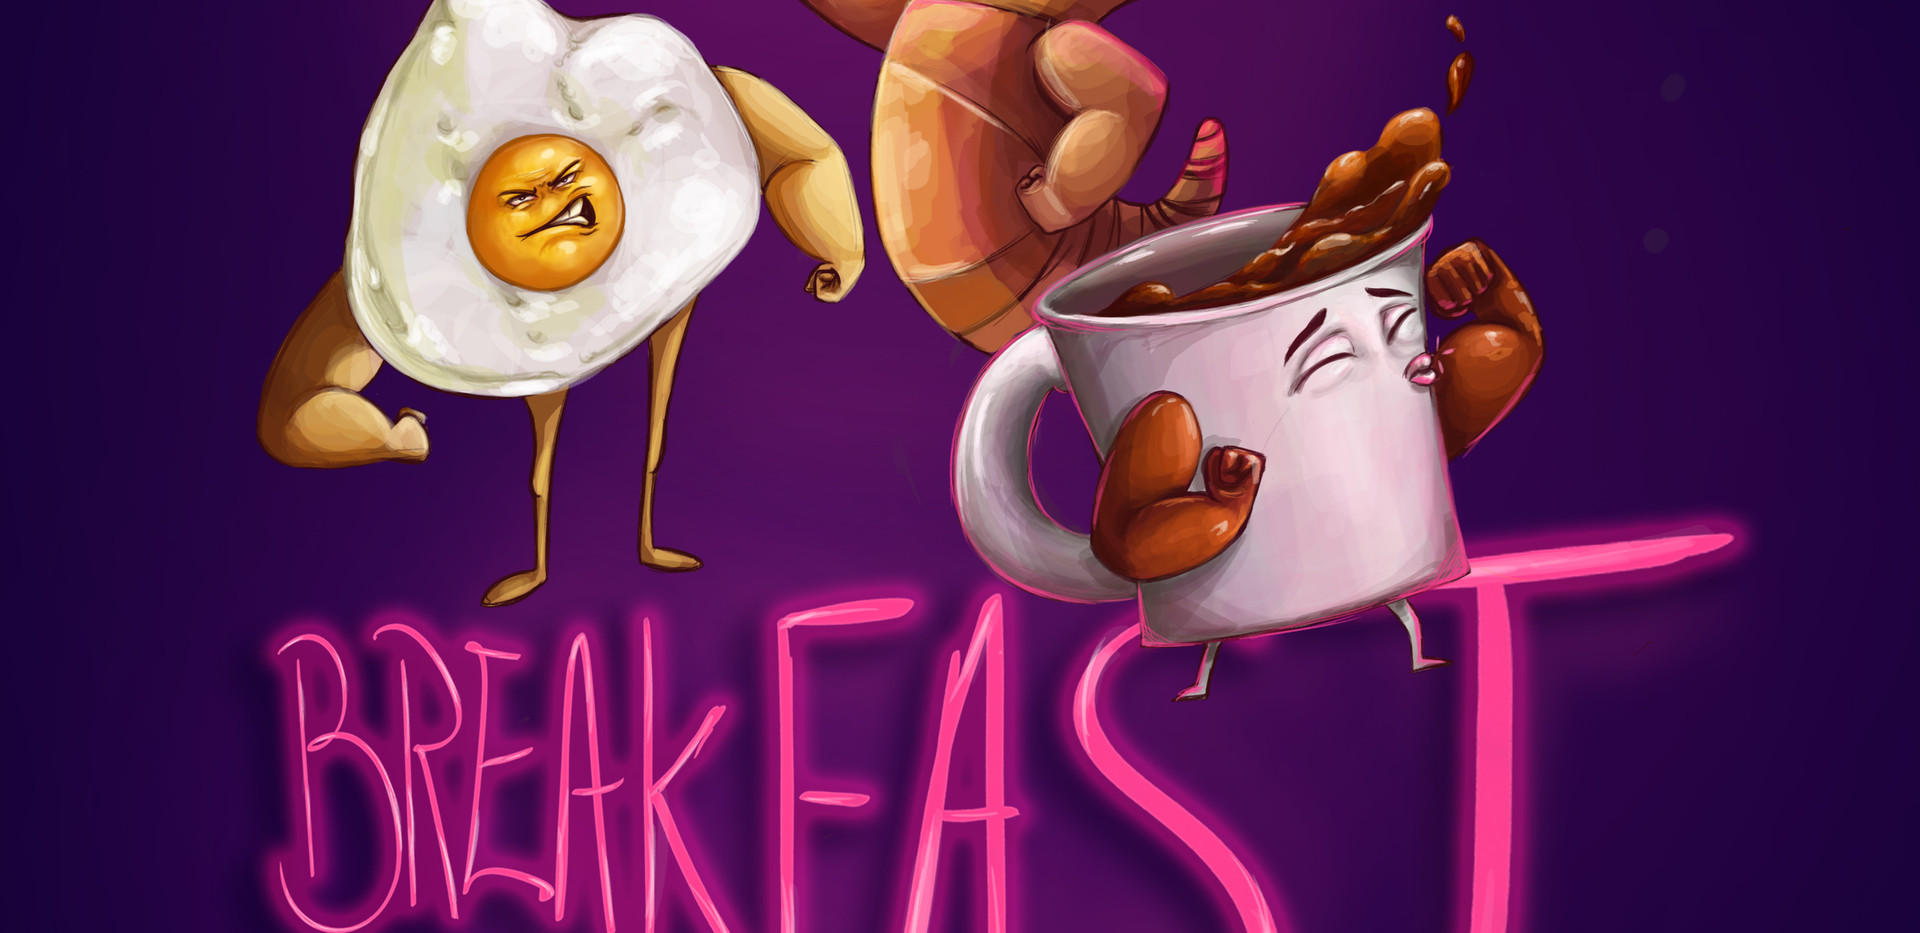 serious breakfast